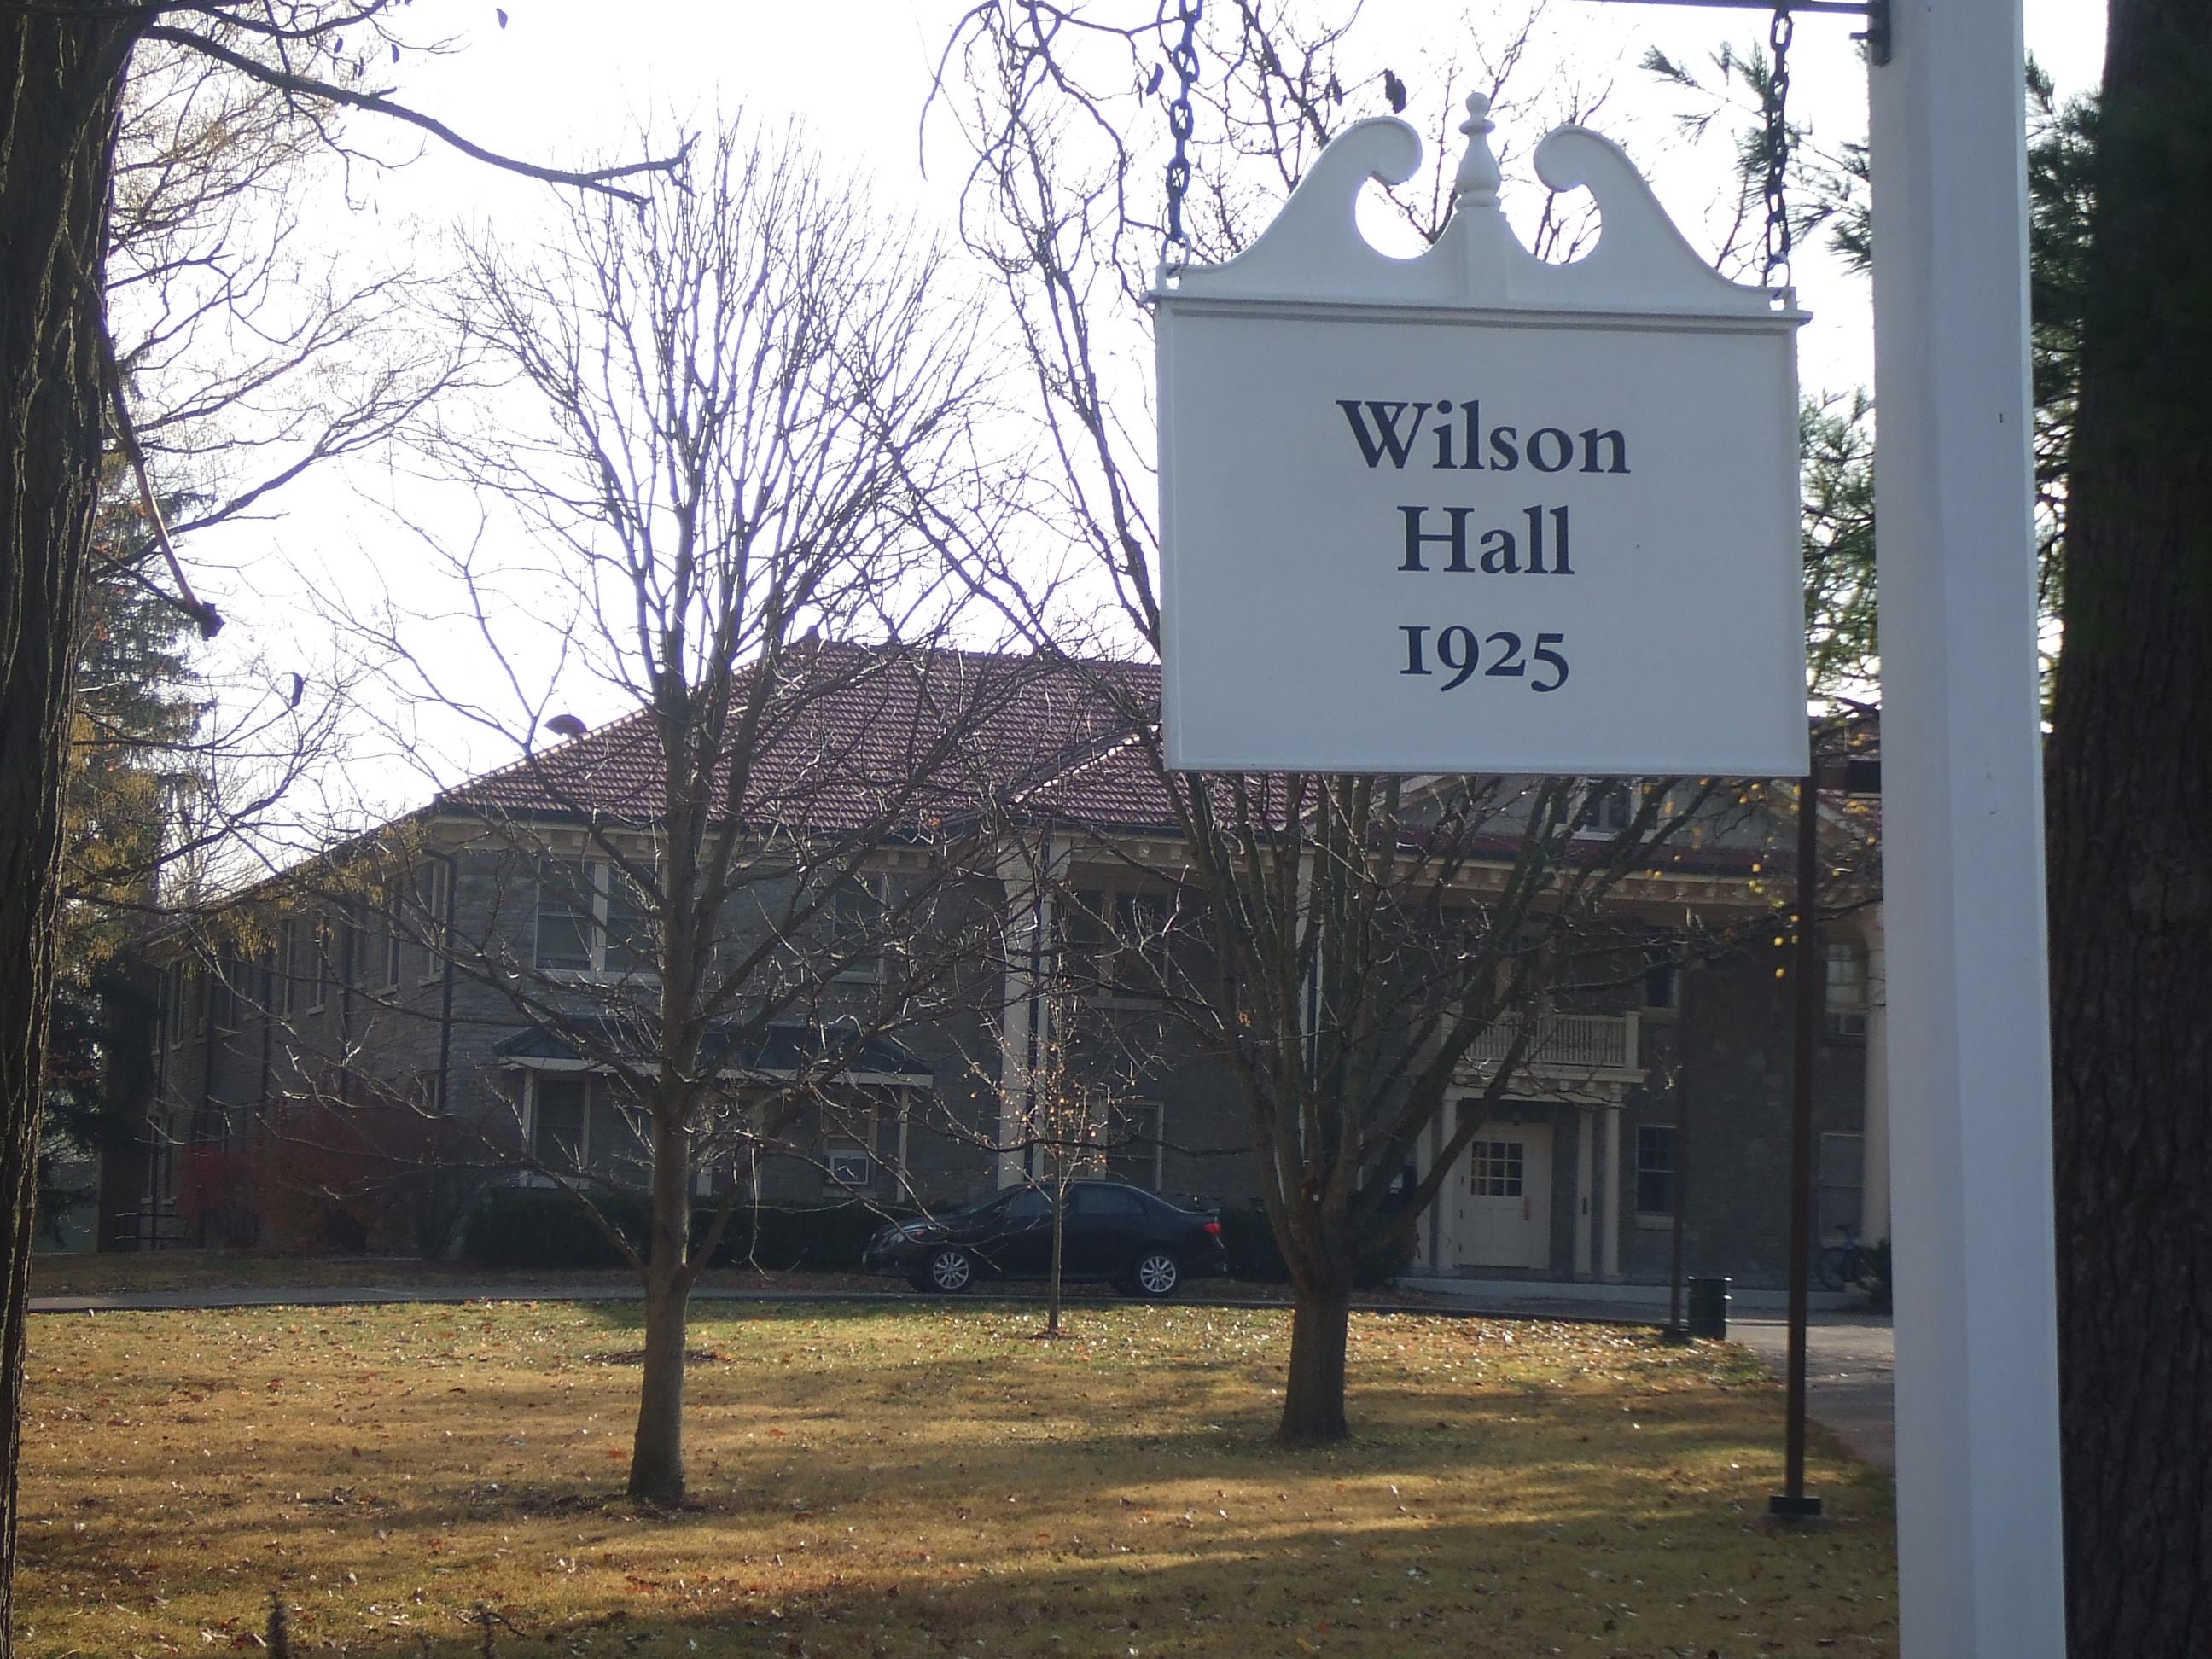 Wilson Hall (Miami University)